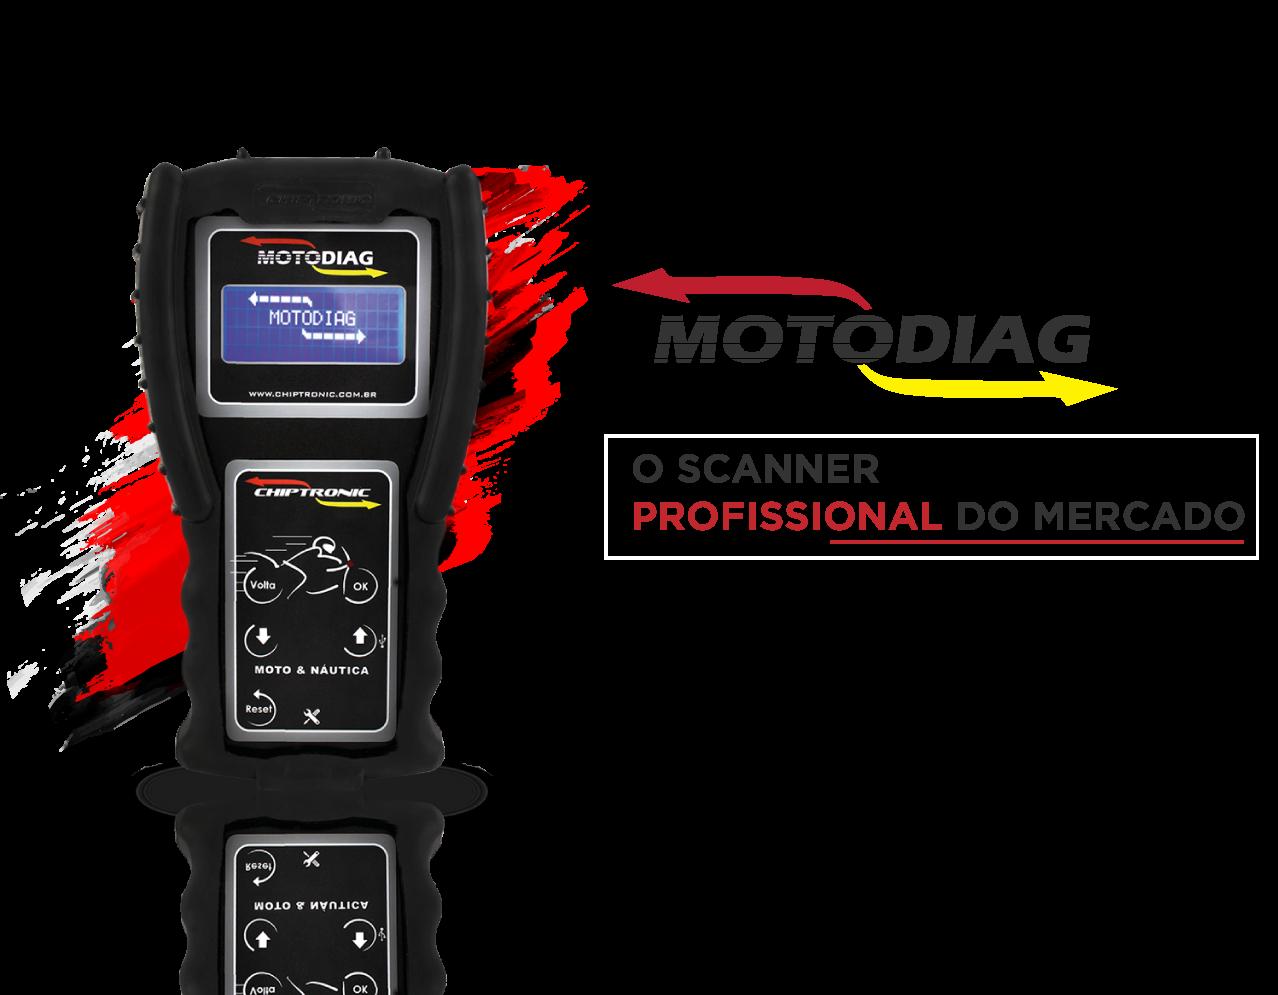 motodiag2-1278x995